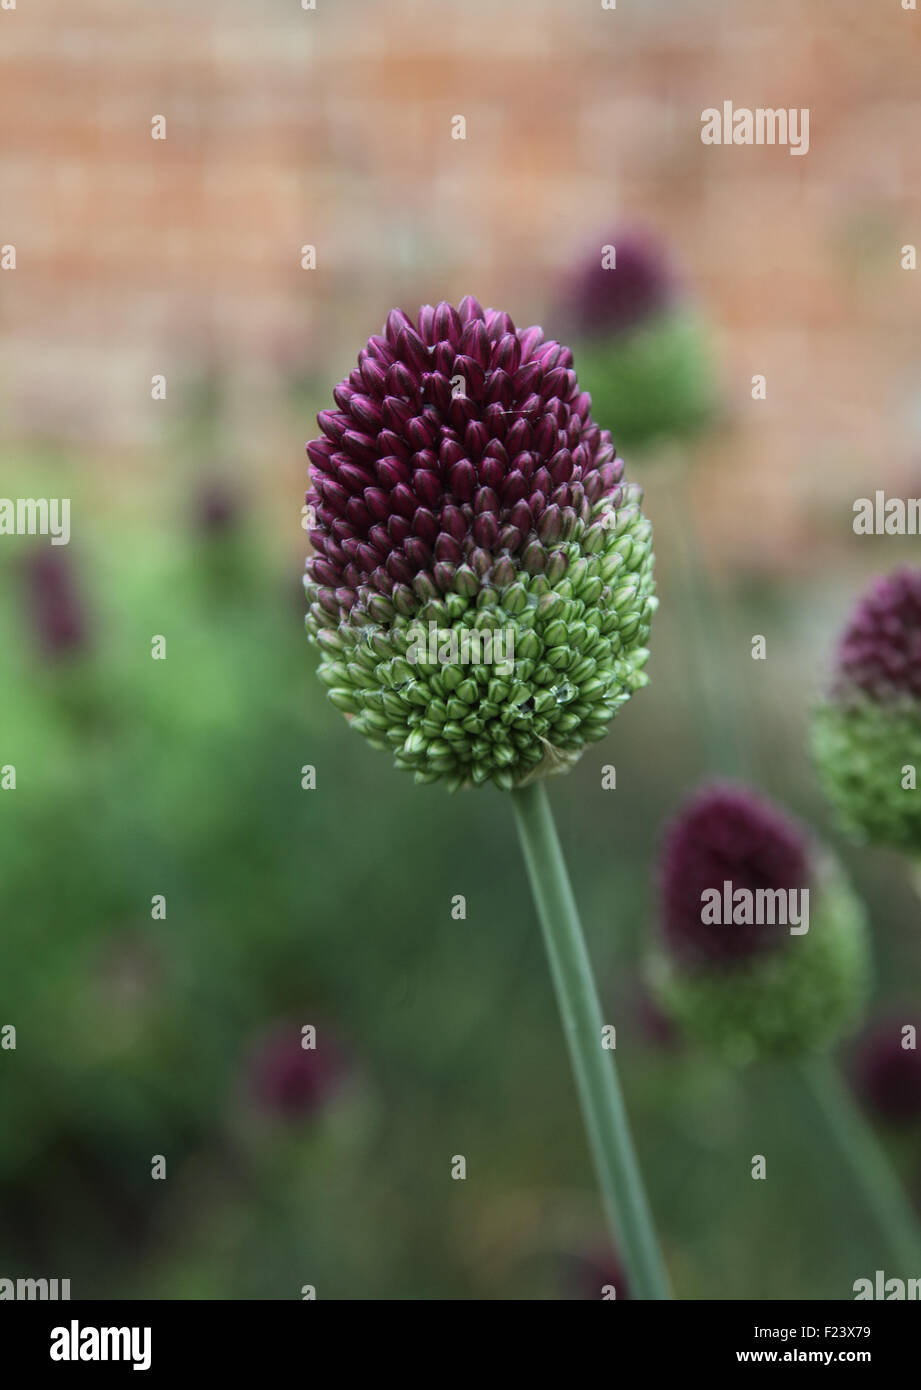 Allium spearocephalum close up of flowerhead - Stock Image